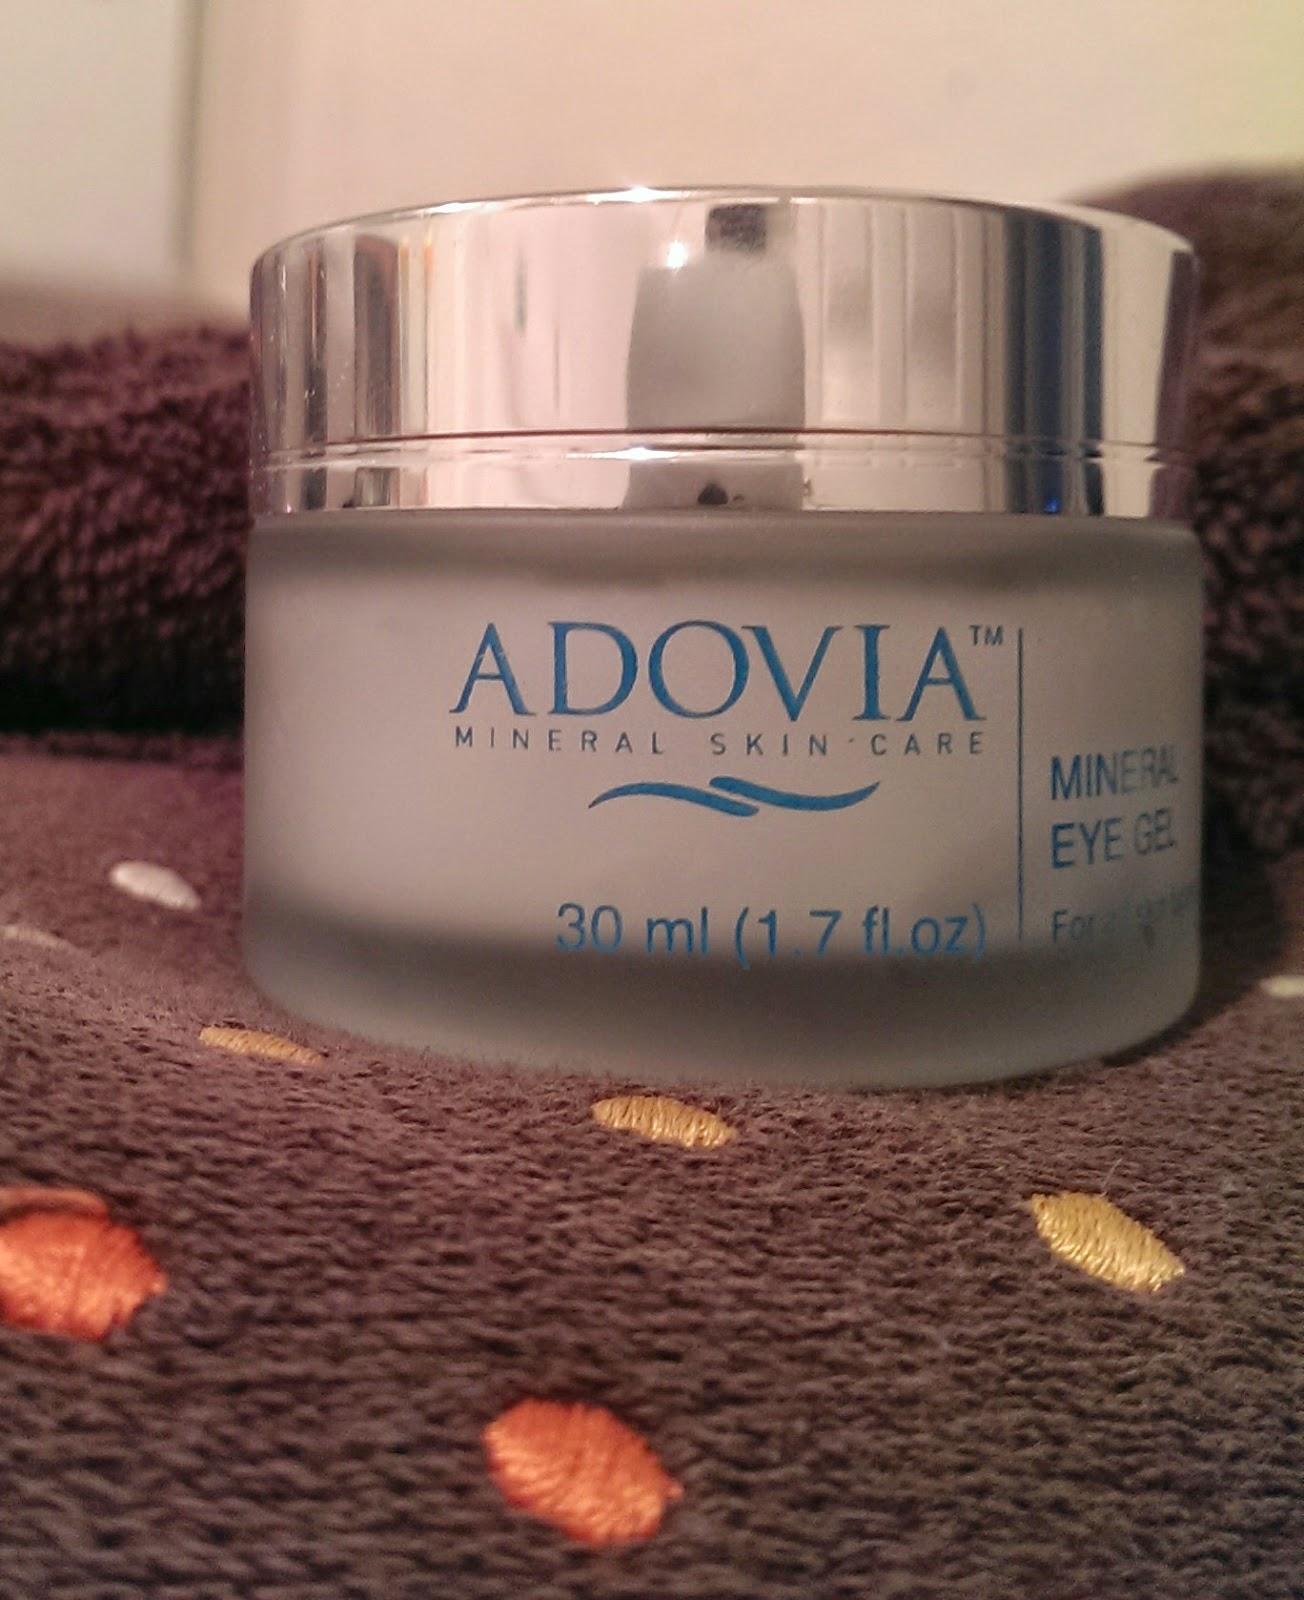 Adovia+Eye+Cream Adovia Mineral Eye Gel Review - Reducing Fine Lines Around Eyes #adovia